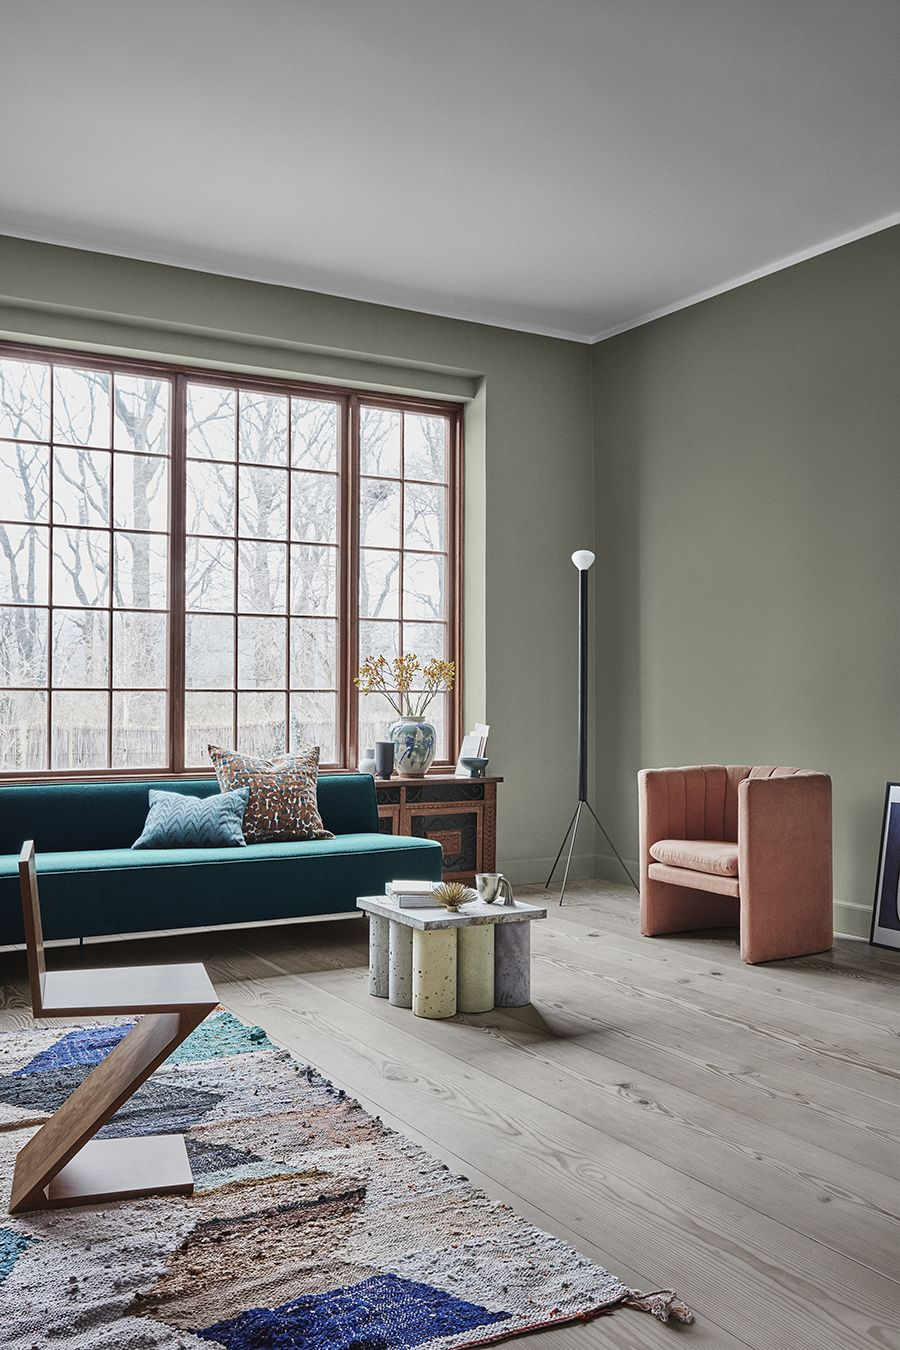 3 Jotun Colors Of The Year 2019 Calm Refined And Raw Hus Innredning Skandinavisk Interior Stuedesign